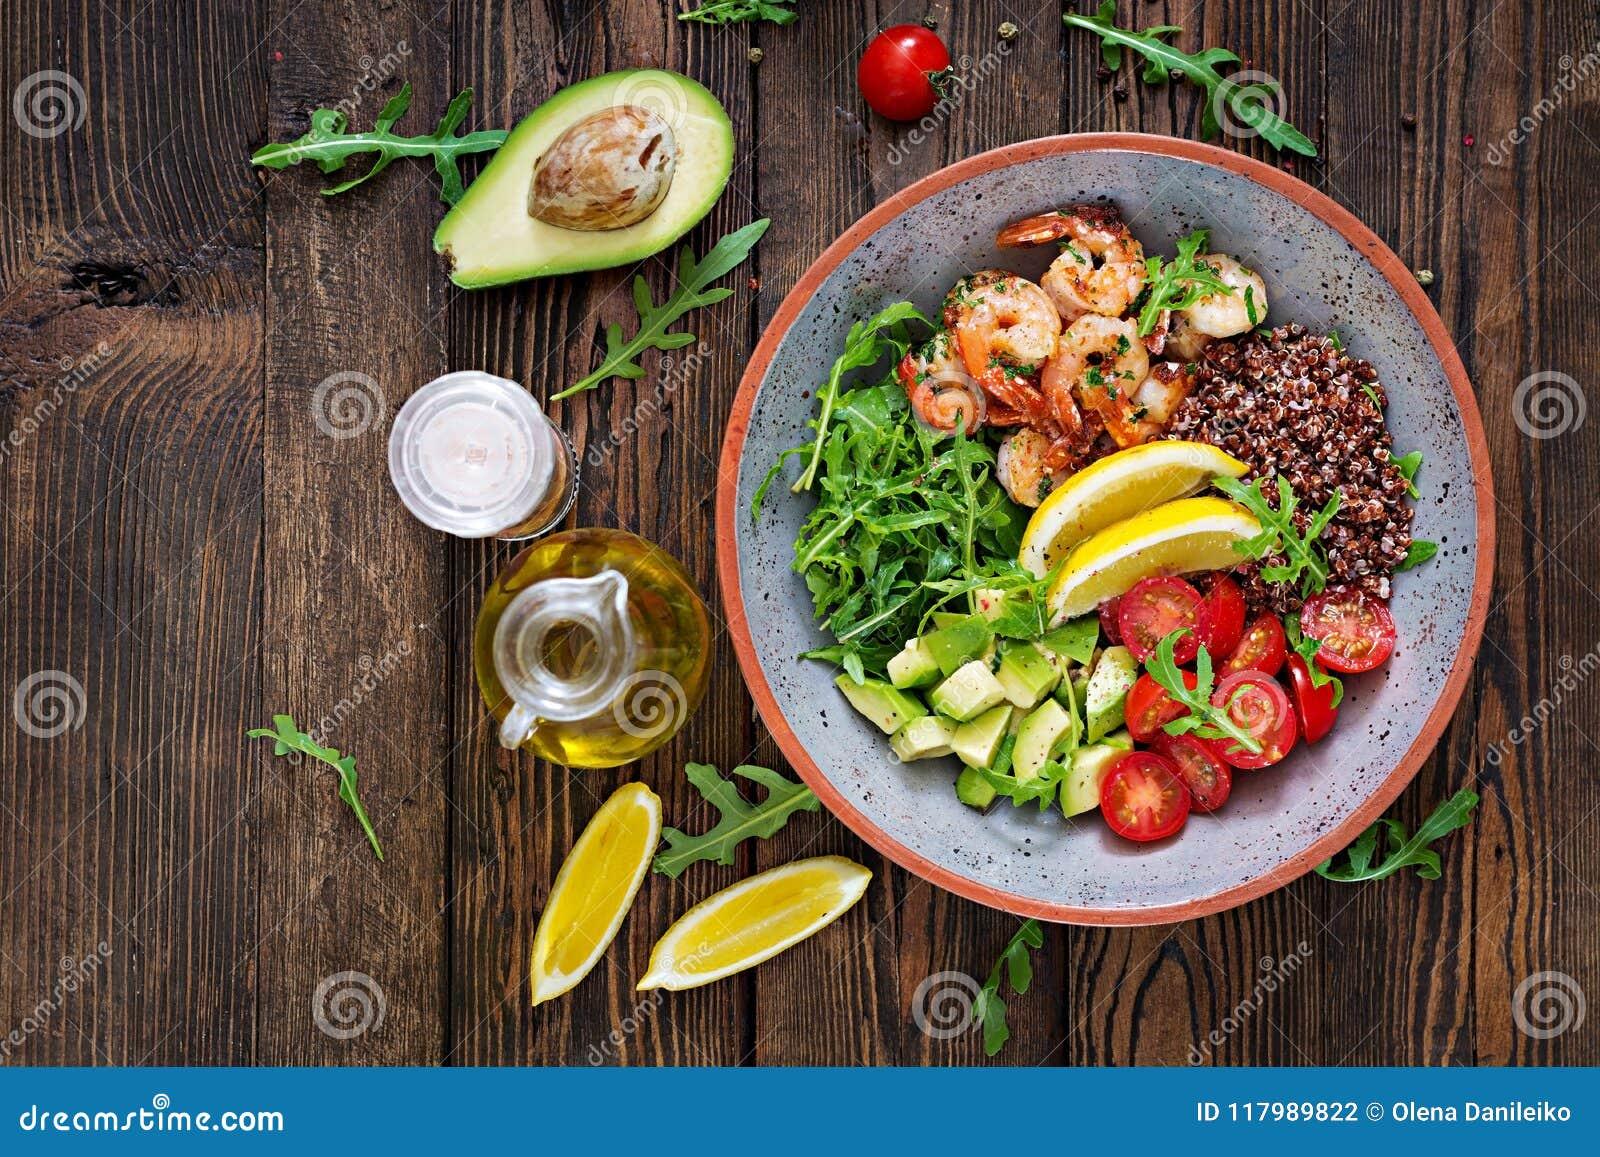 Buddha bowl with shrimps, tomato, avocado, quinoa, lemon and arugula